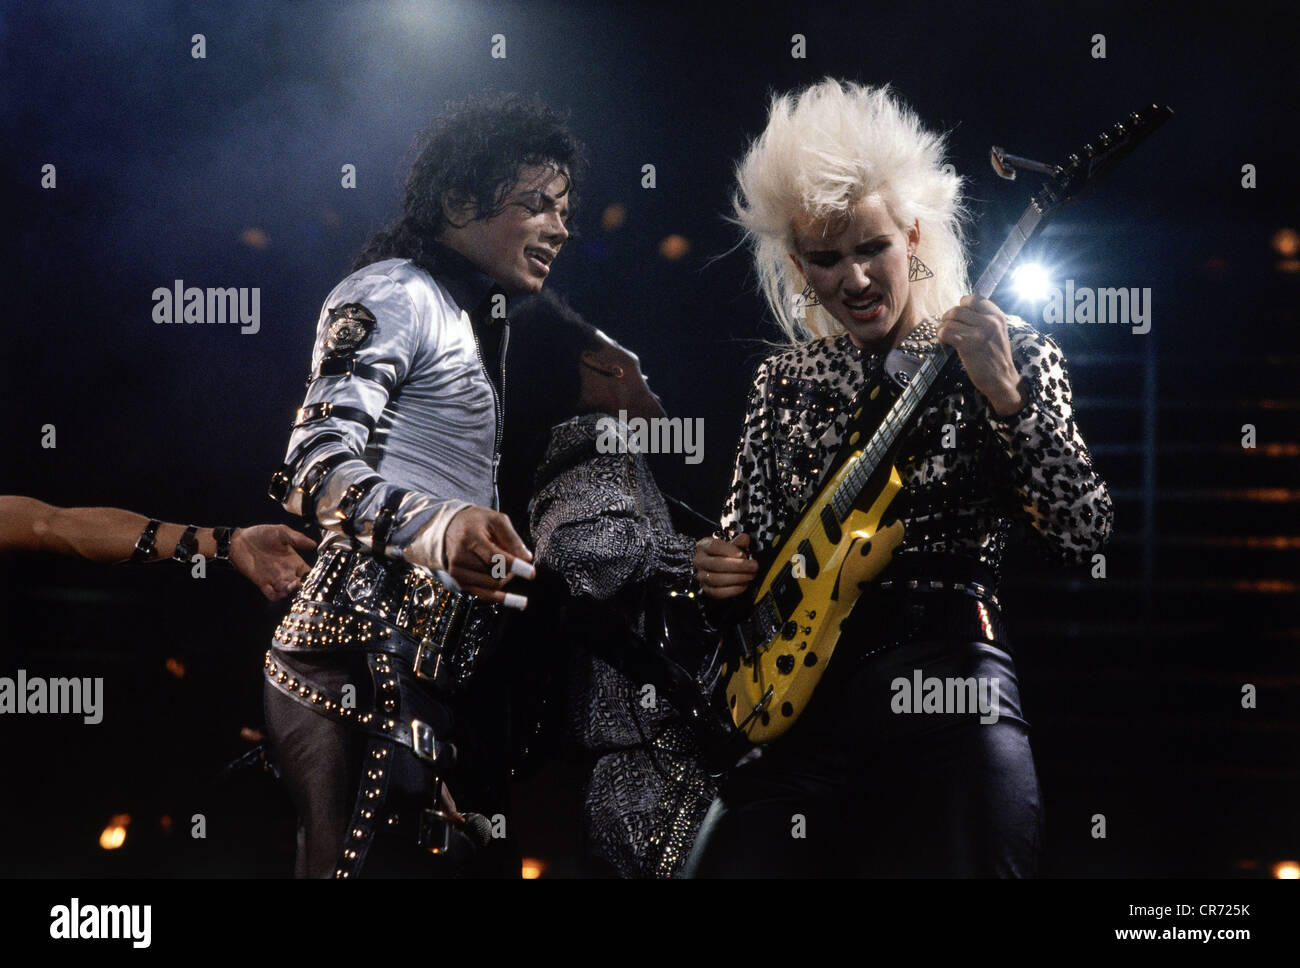 Jackson, Michael, 29.8.1958 - 25.6.2009, American musician (singer), half length, during music performance, Bad - Stock Image